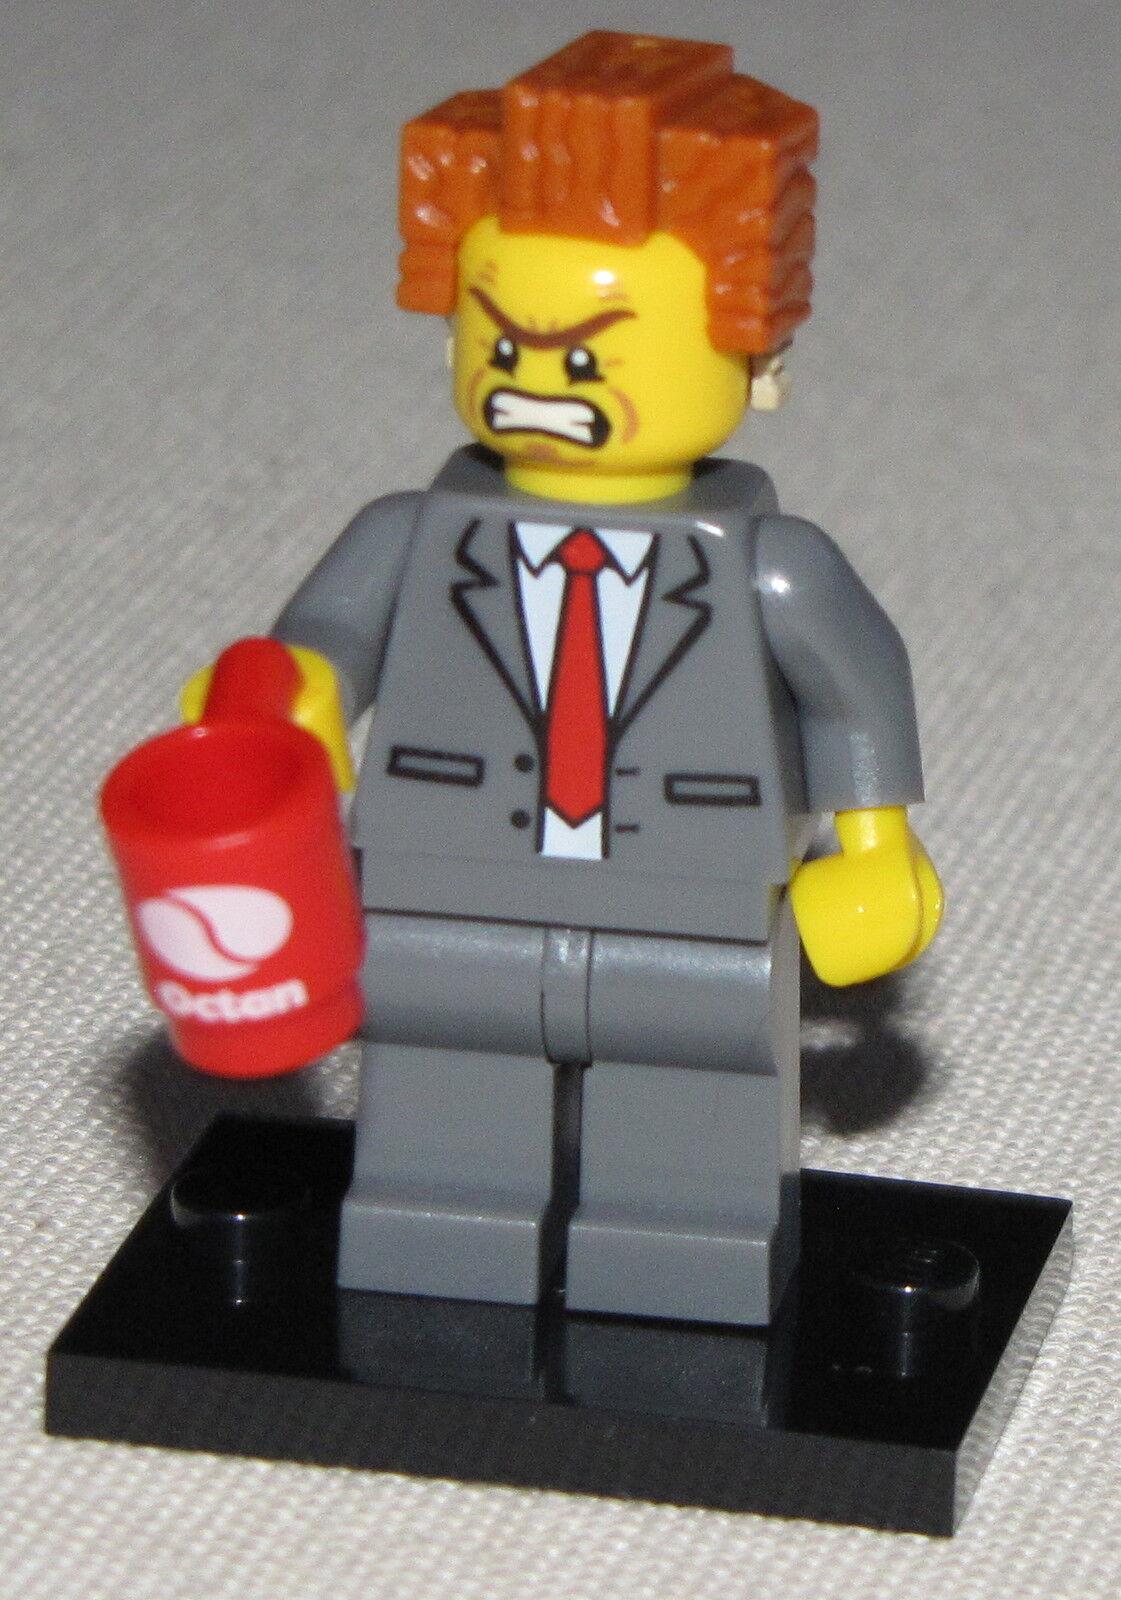 Lego Nuevo Serie 12 The Movie Presidente Business Figura Higo Minifigura 71004